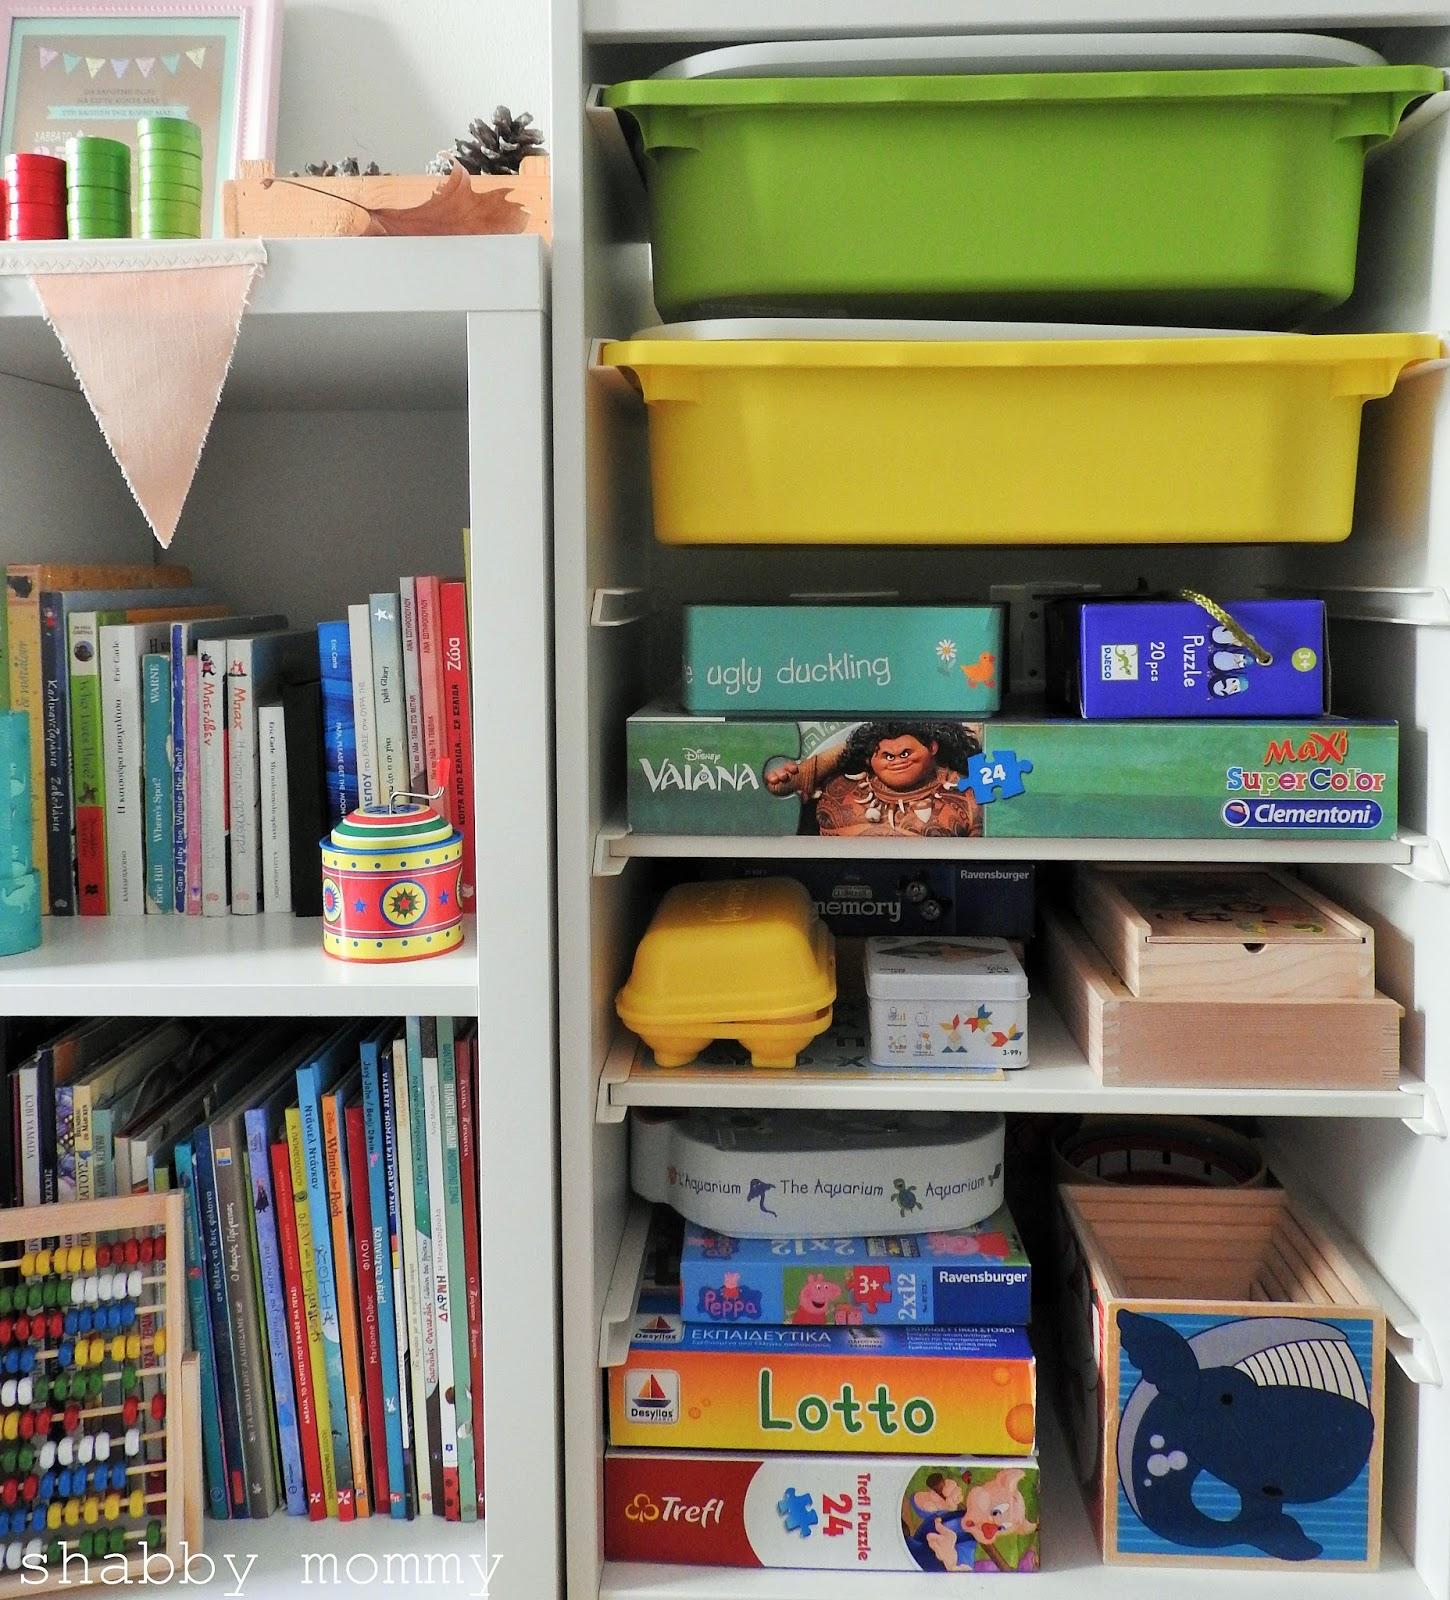 c78fa1dfeef Ξεψαχνίζοντας τις αναρτήσεις σε ξένα άρθρα και blogs είχα διαβάσει πως μια  σκηνή στο παιδικό δωμάτιο είναι υπέροχη ιδέα, όχι τόσο σαν παιχνίδι για το  παιδί, ...